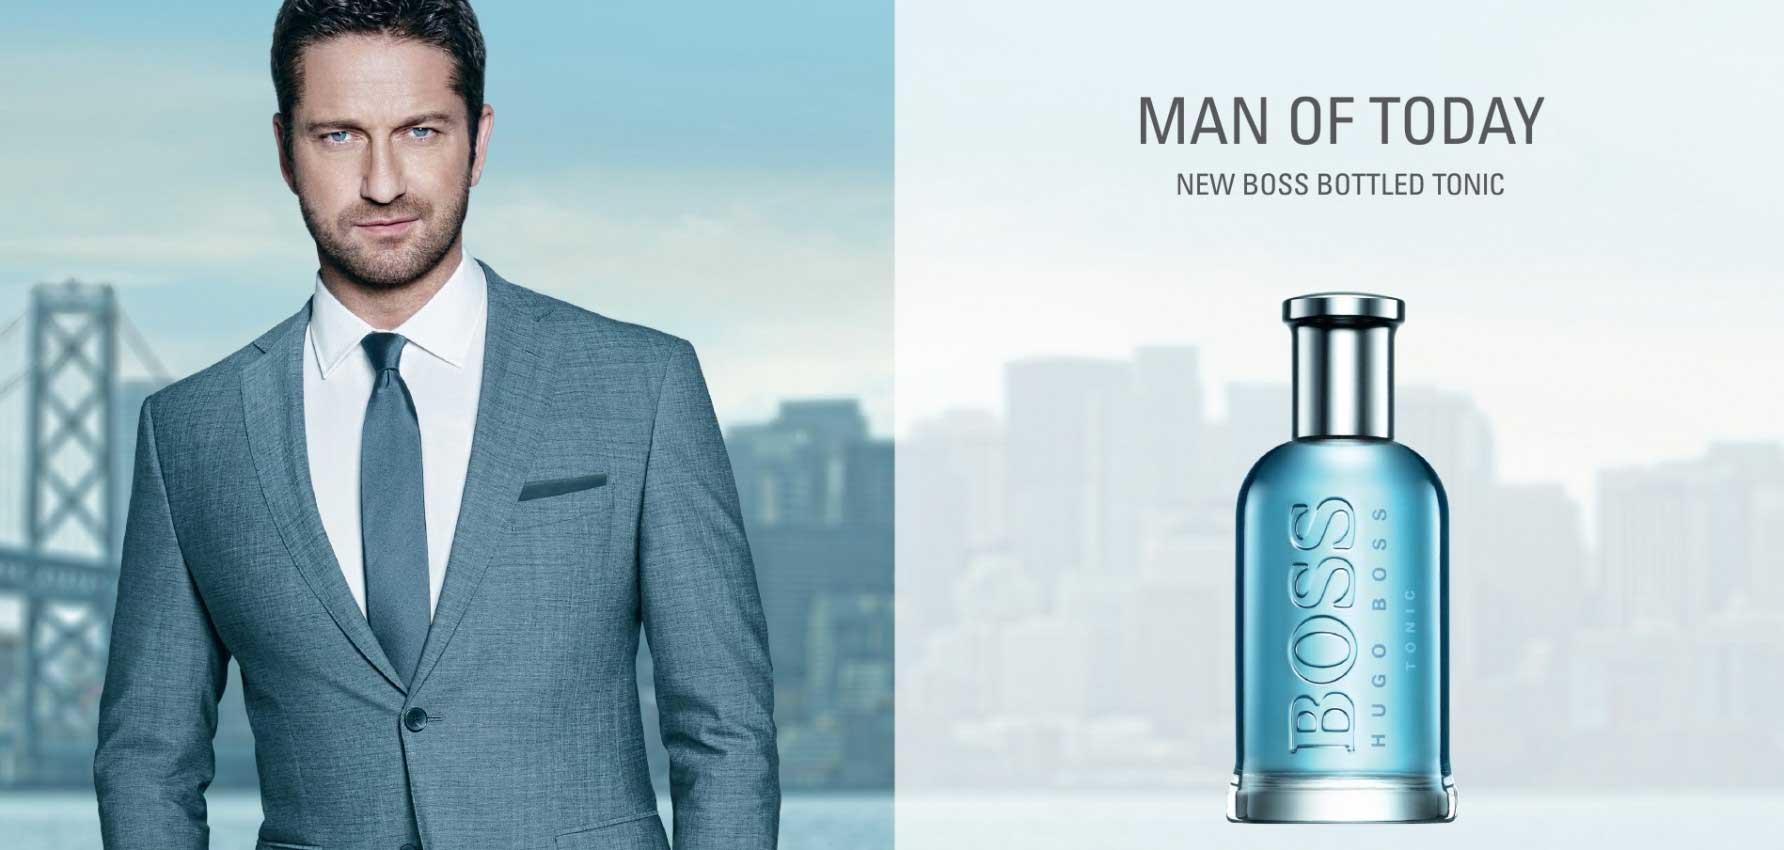 boss bottled tonic hugo boss cologne ein neues parfum. Black Bedroom Furniture Sets. Home Design Ideas